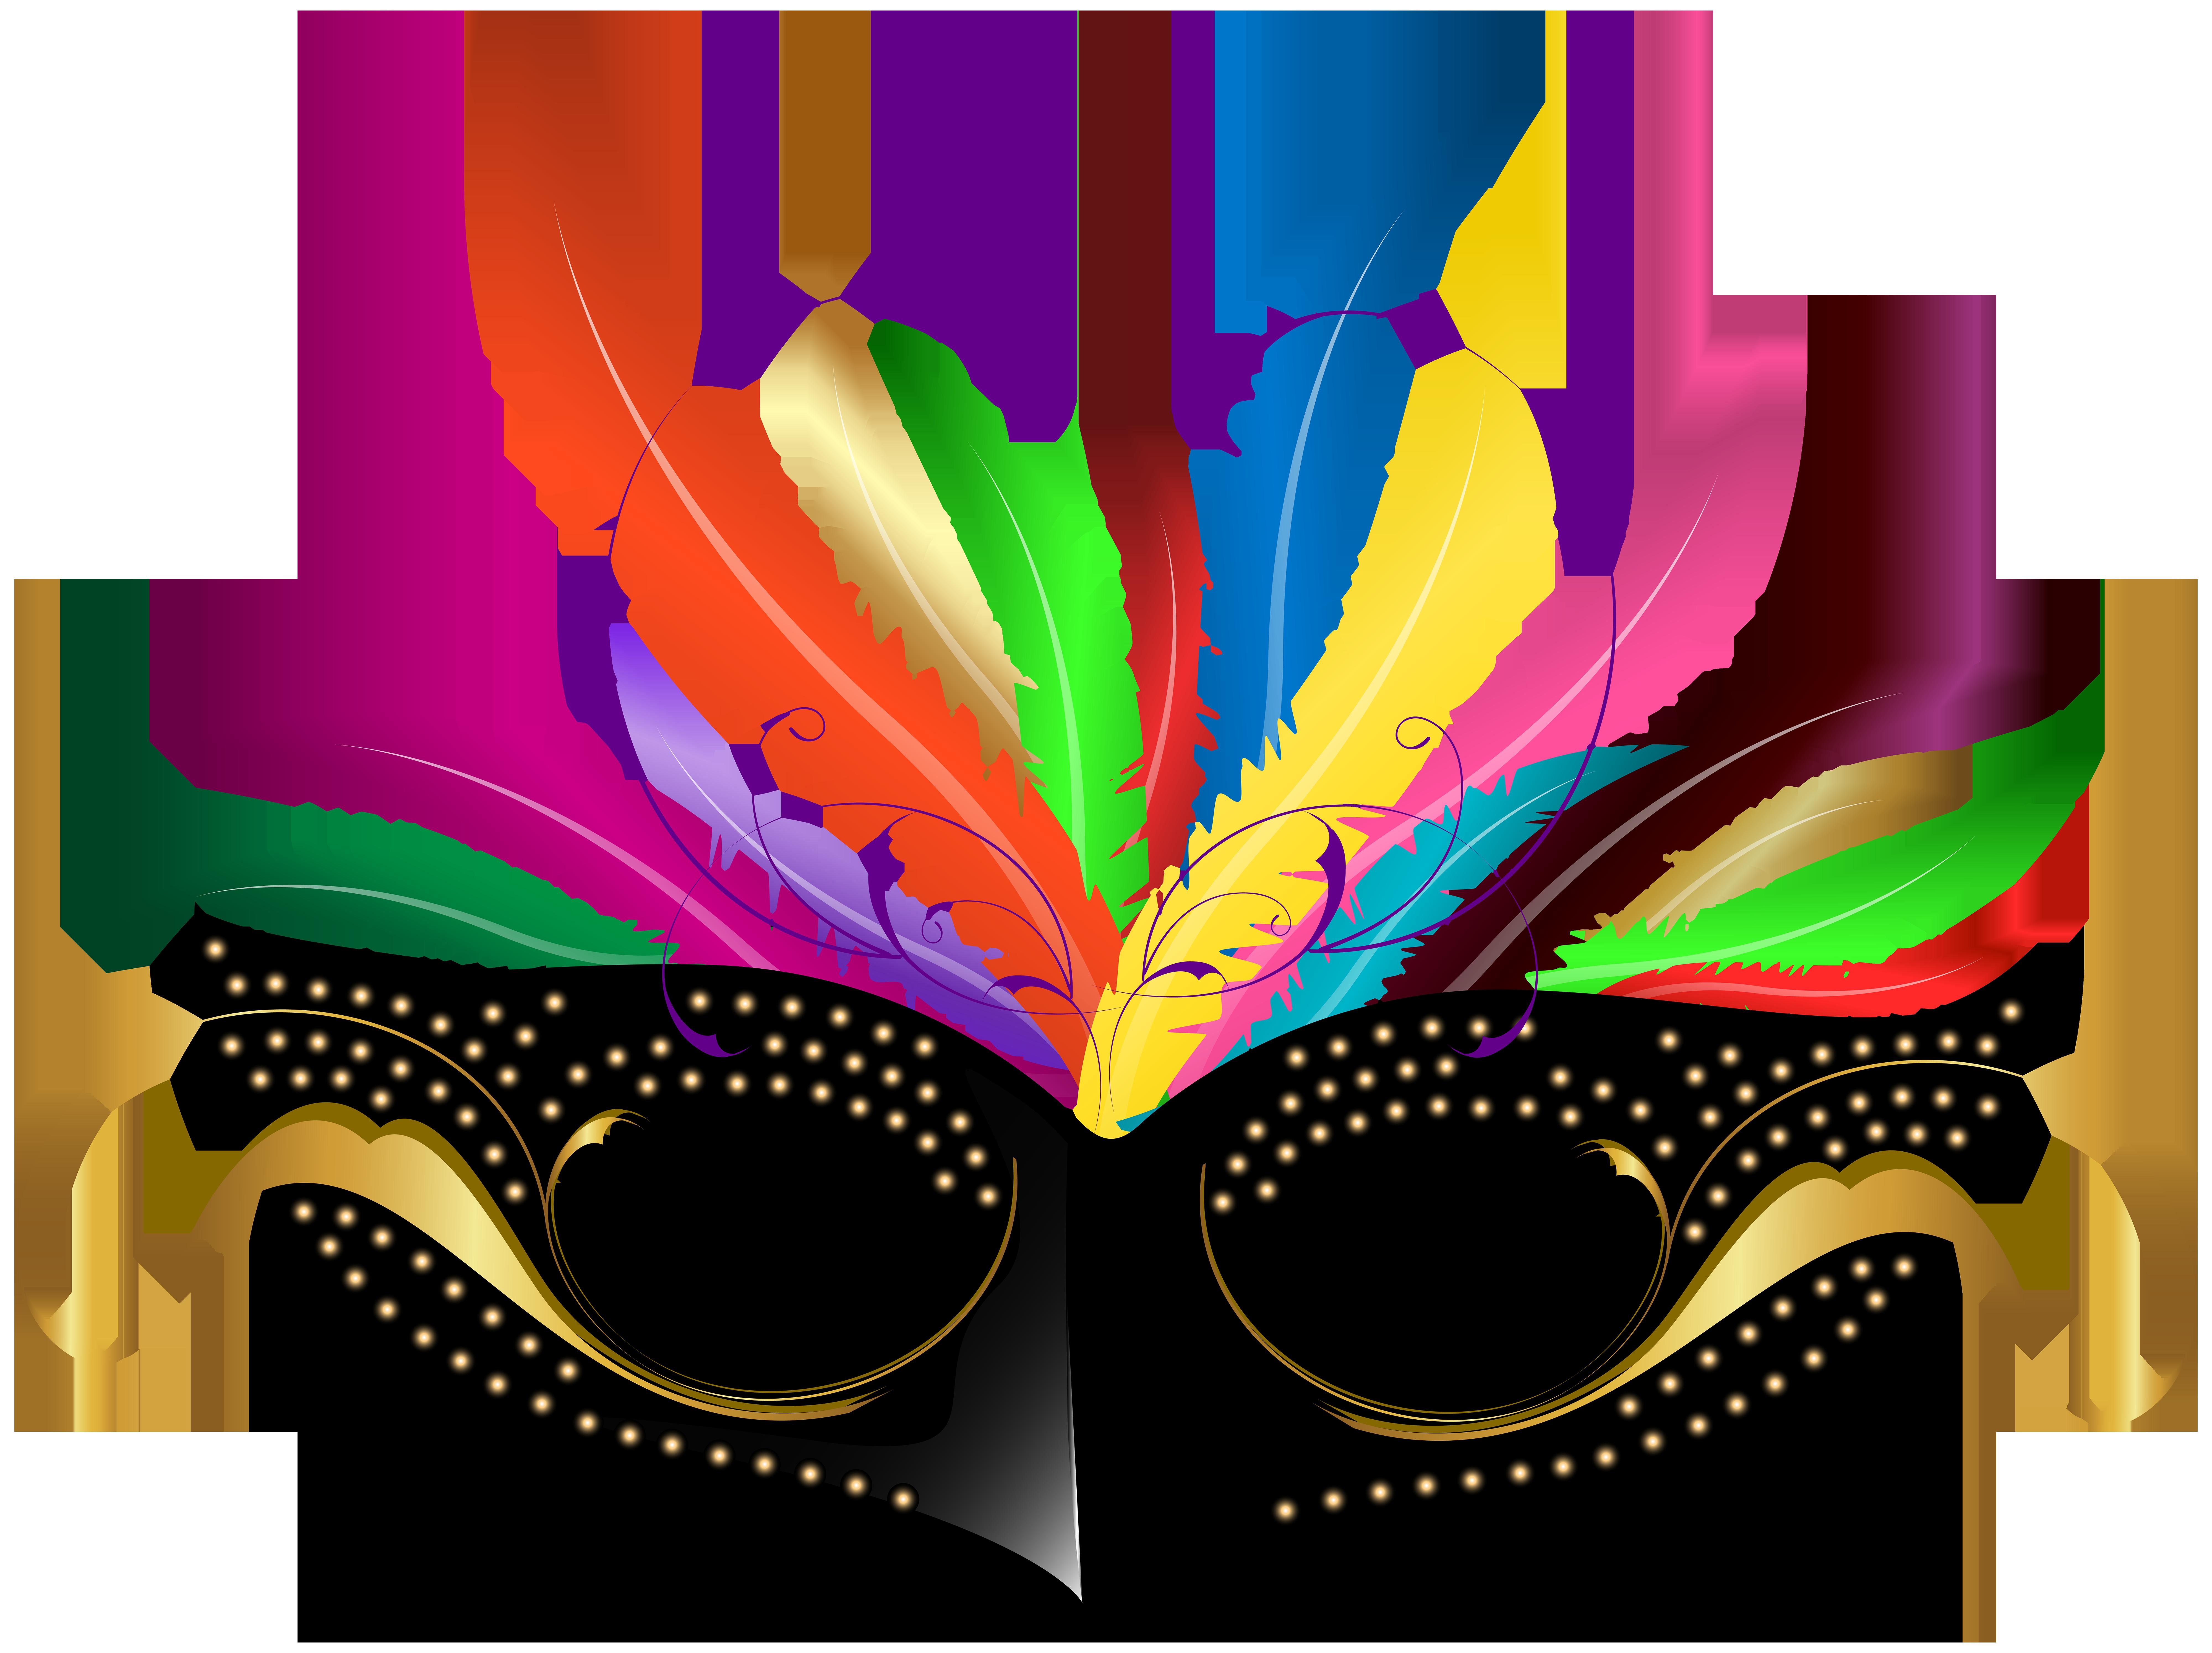 8000x5978 Carnival Mask Png Transparent Clip Art Imageu200b Gallery